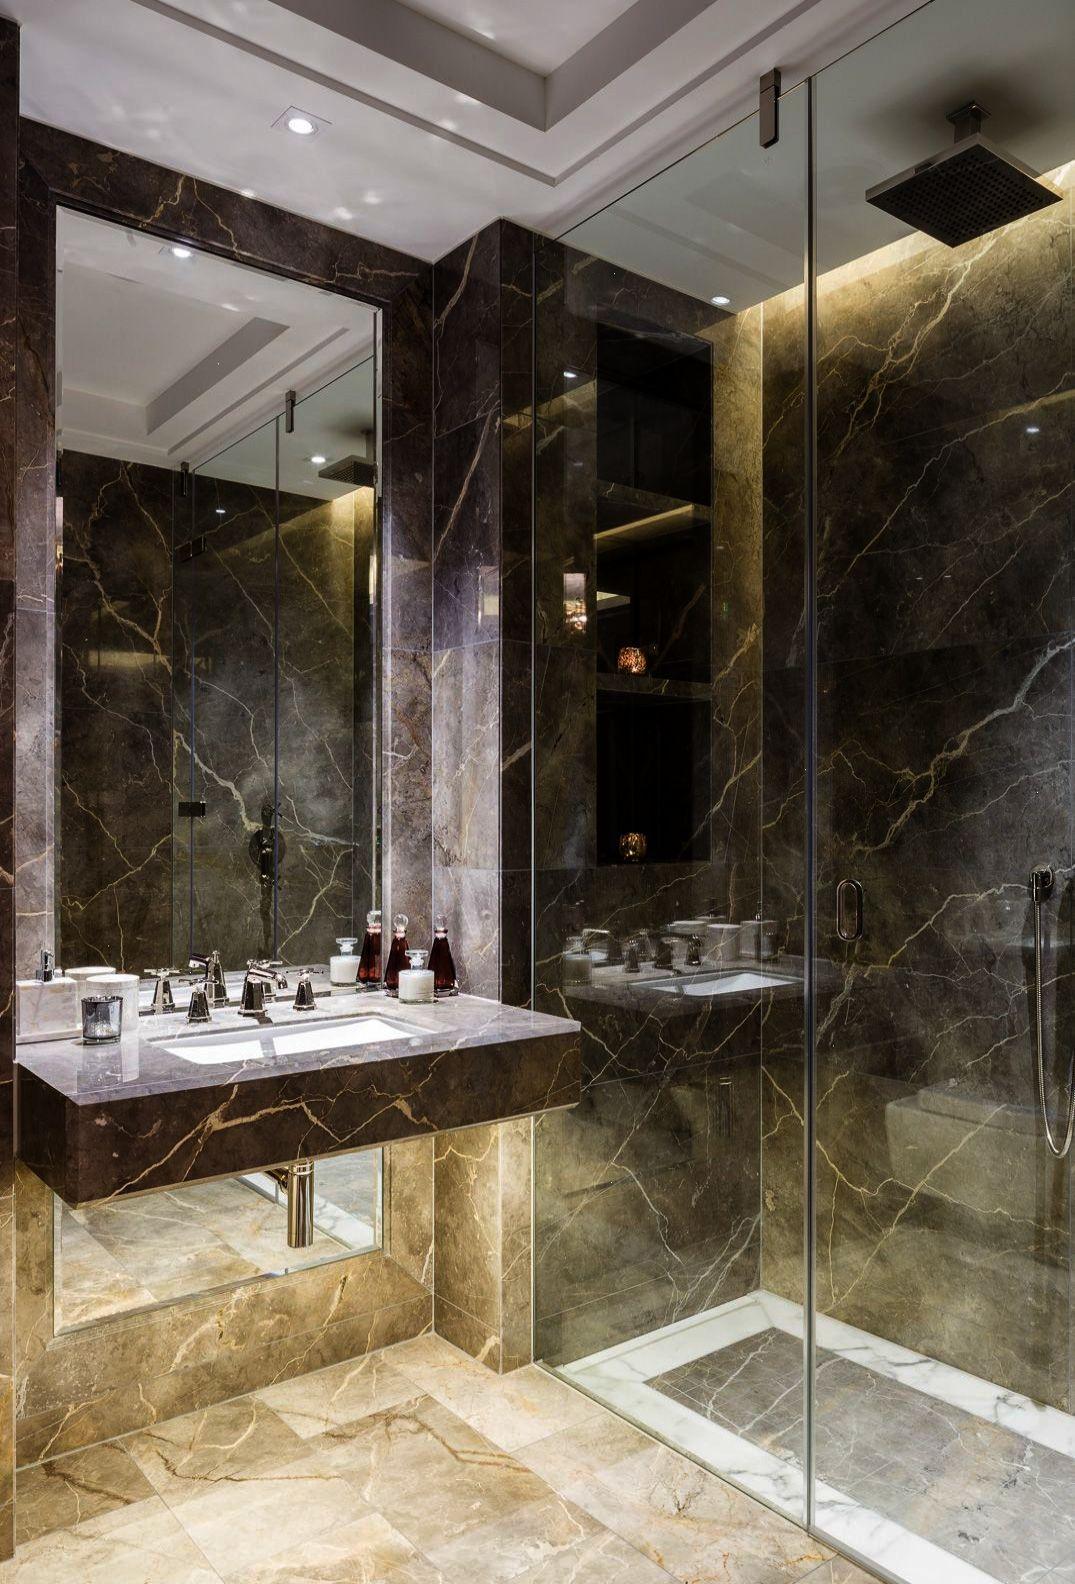 private apartment belgravia the girls bathroom has fior di bosco rh pinterest com